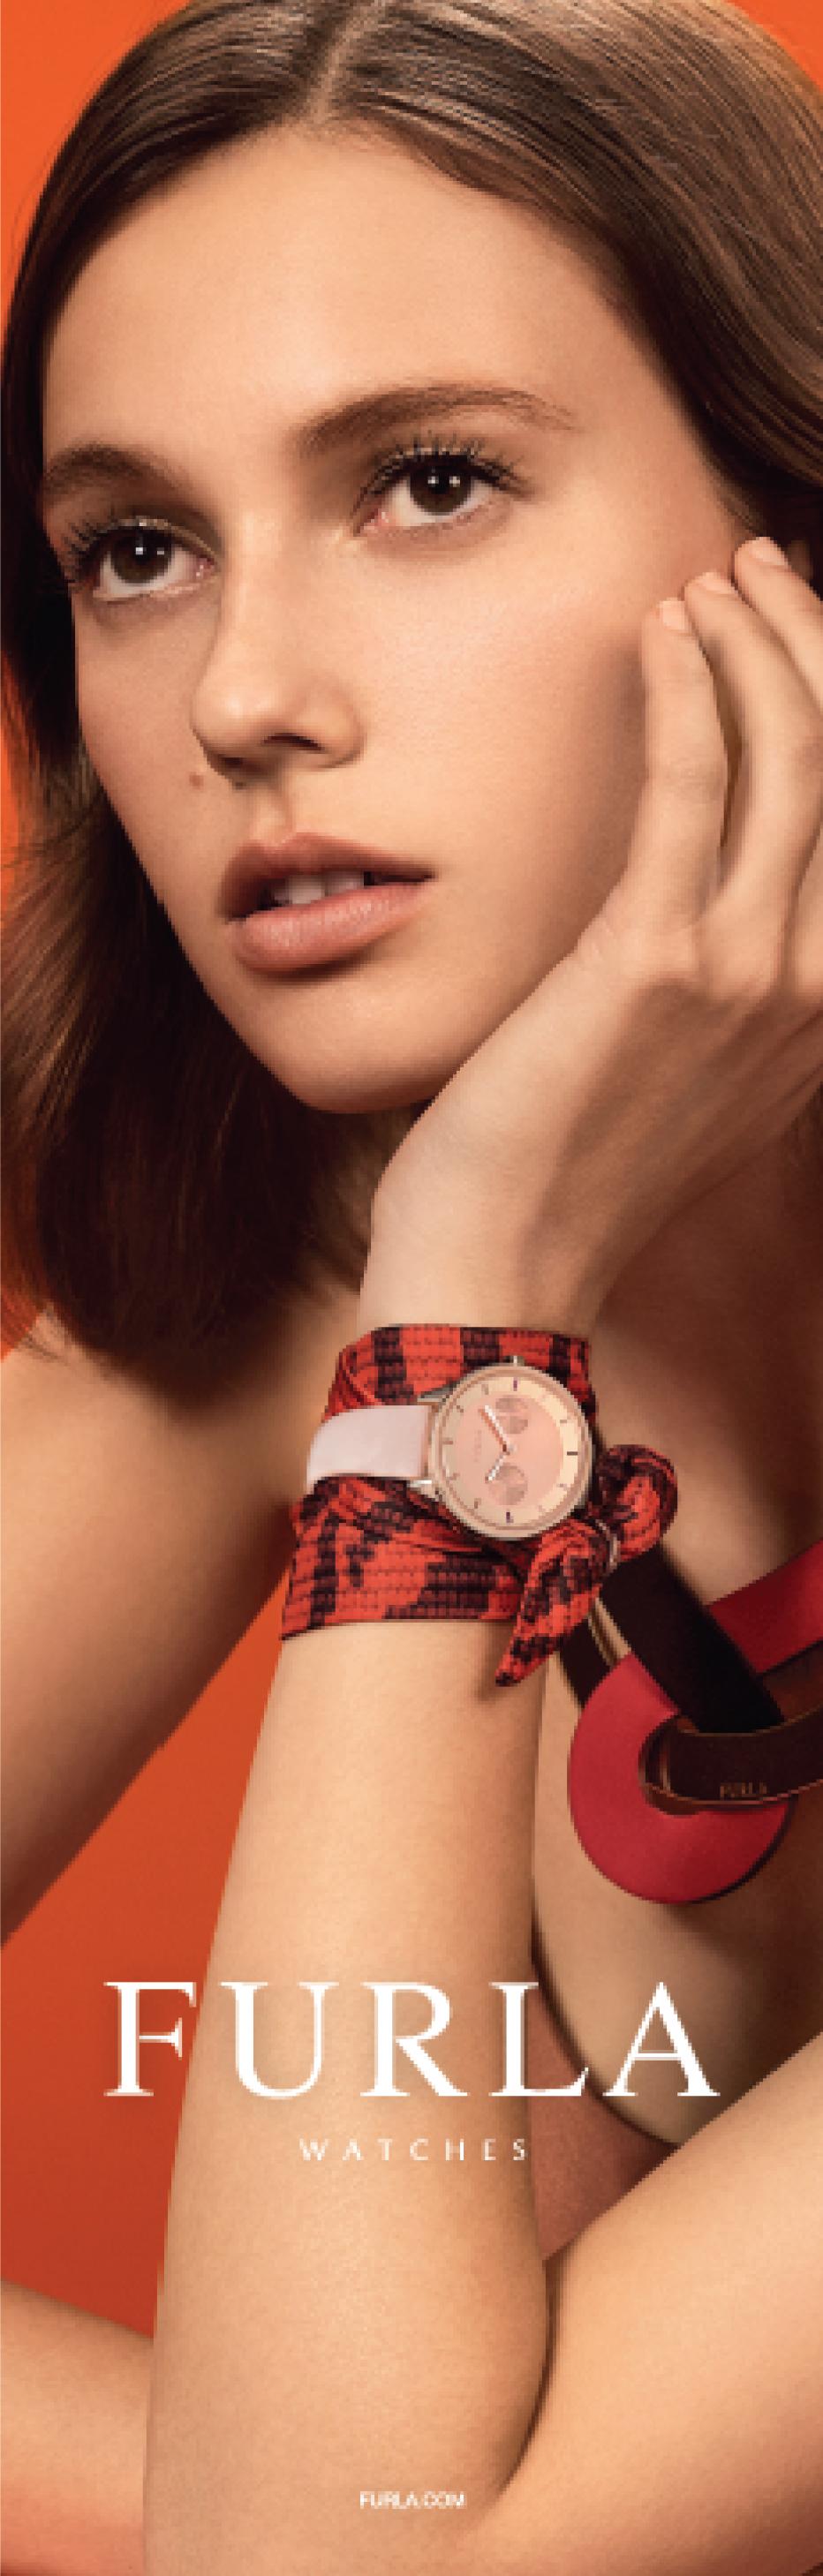 Furla-watch-inflight-presence_2.jpg